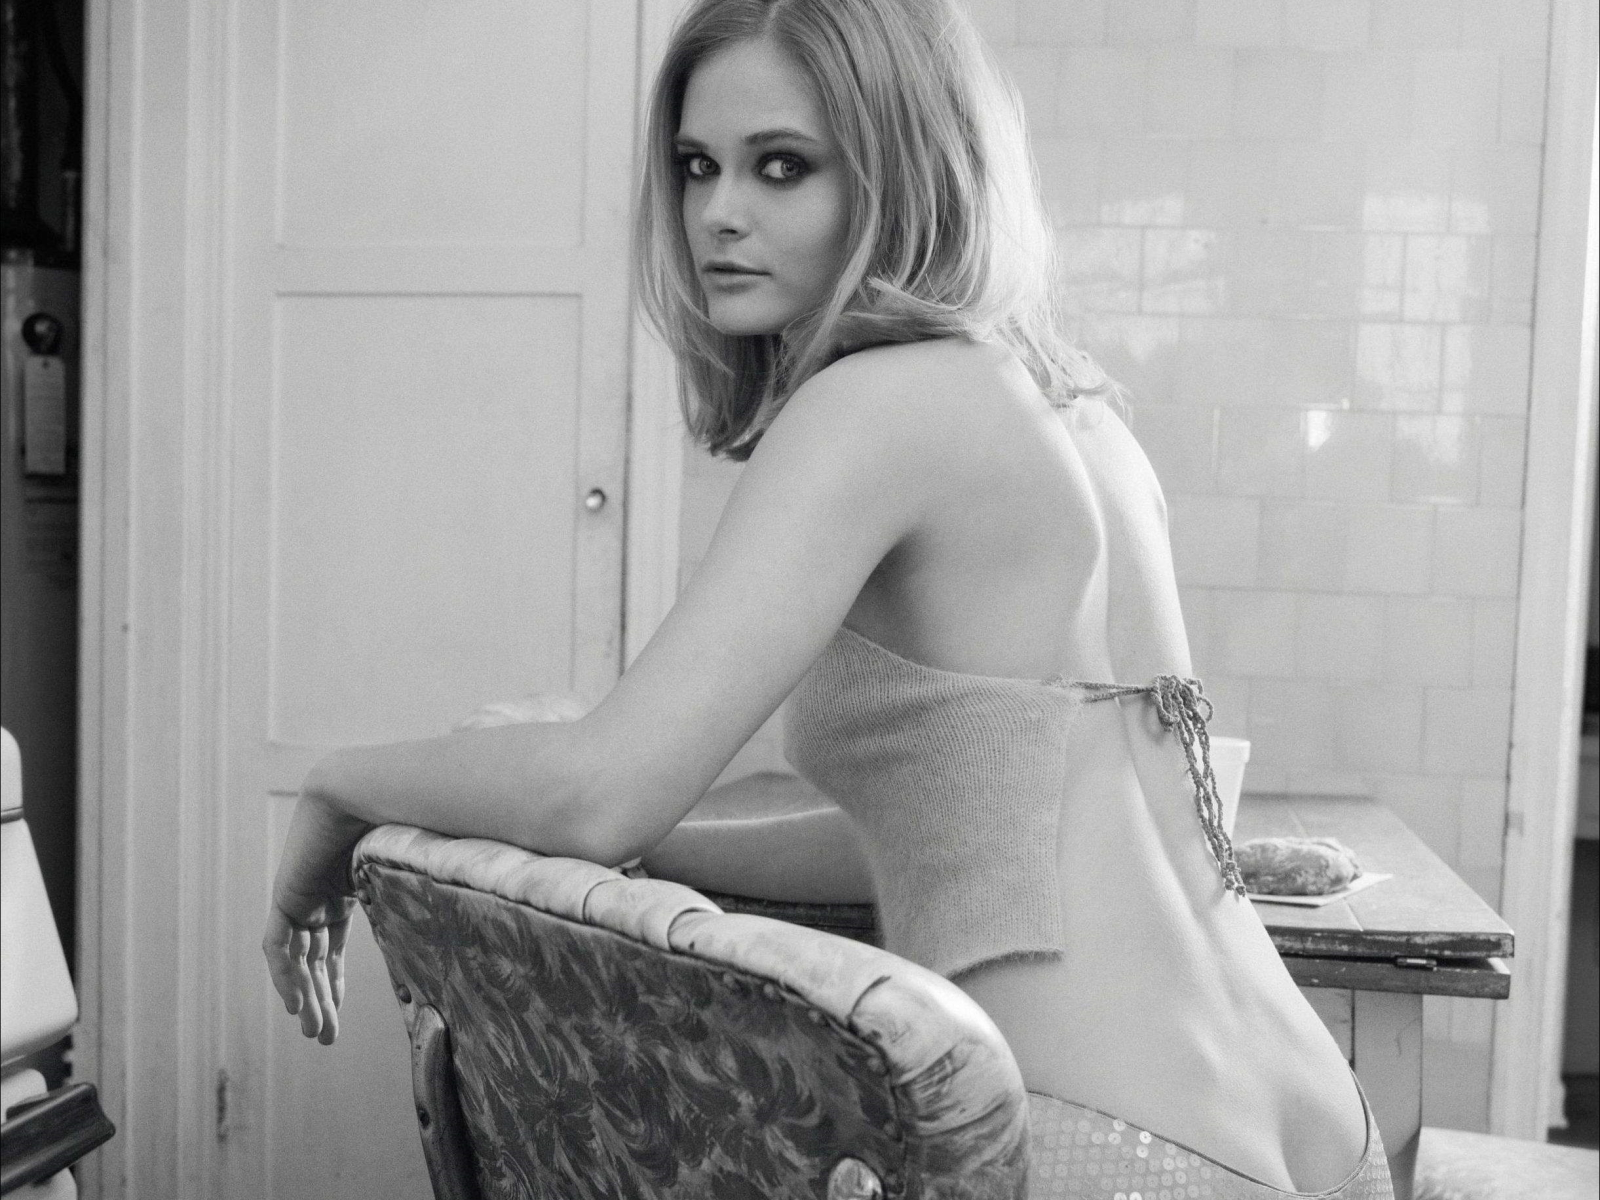 Rachel blanchard sexy